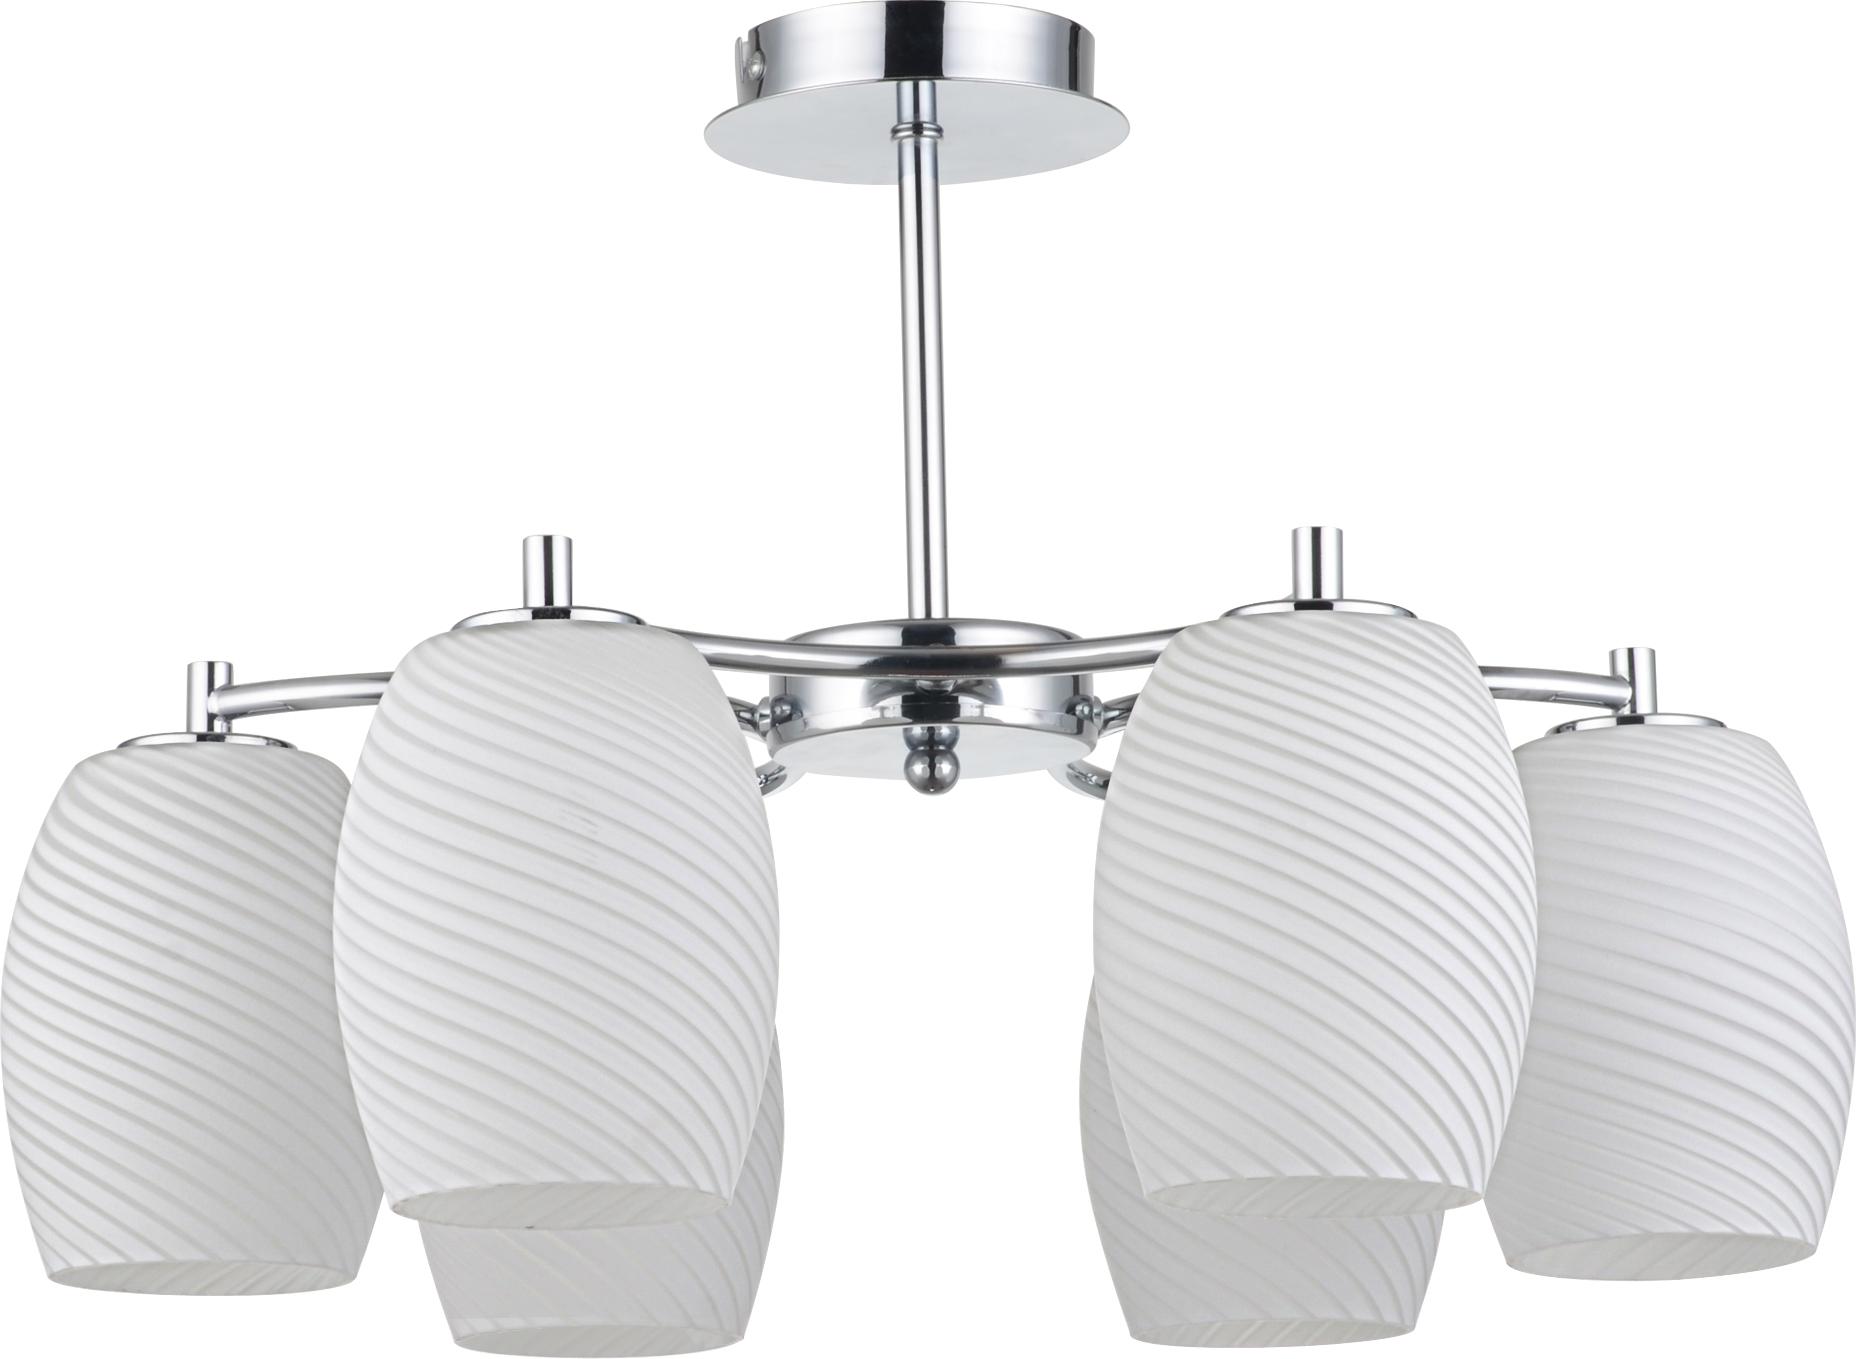 Люстра LussoleЛюстры<br>Назначение светильника: для комнаты,<br>Стиль светильника: модерн,<br>Тип: потолочная,<br>Материал светильника: металл, стекло,<br>Материал плафона: стекло,<br>Материал арматуры: металл,<br>Длина (мм): 350,<br>Ширина: 480,<br>Количество ламп: 6,<br>Тип лампы: накаливания,<br>Мощность: 40,<br>Патрон: Е14,<br>Цвет арматуры: хром<br>